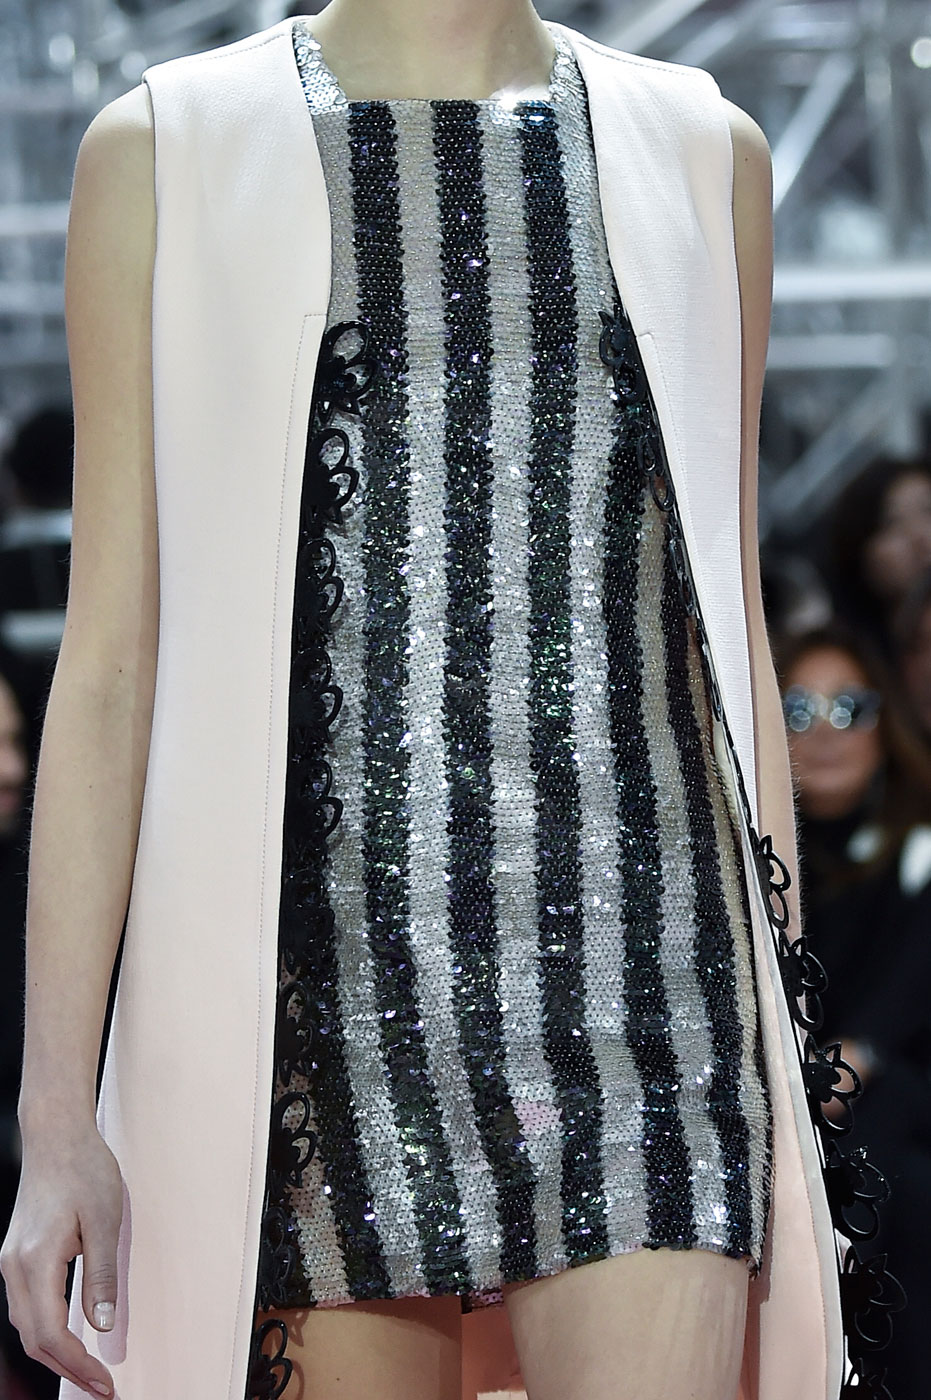 Christian-Dior-fashion-runway-show-close-ups-haute-couture-paris-spring-summer-2015-the-impression-119